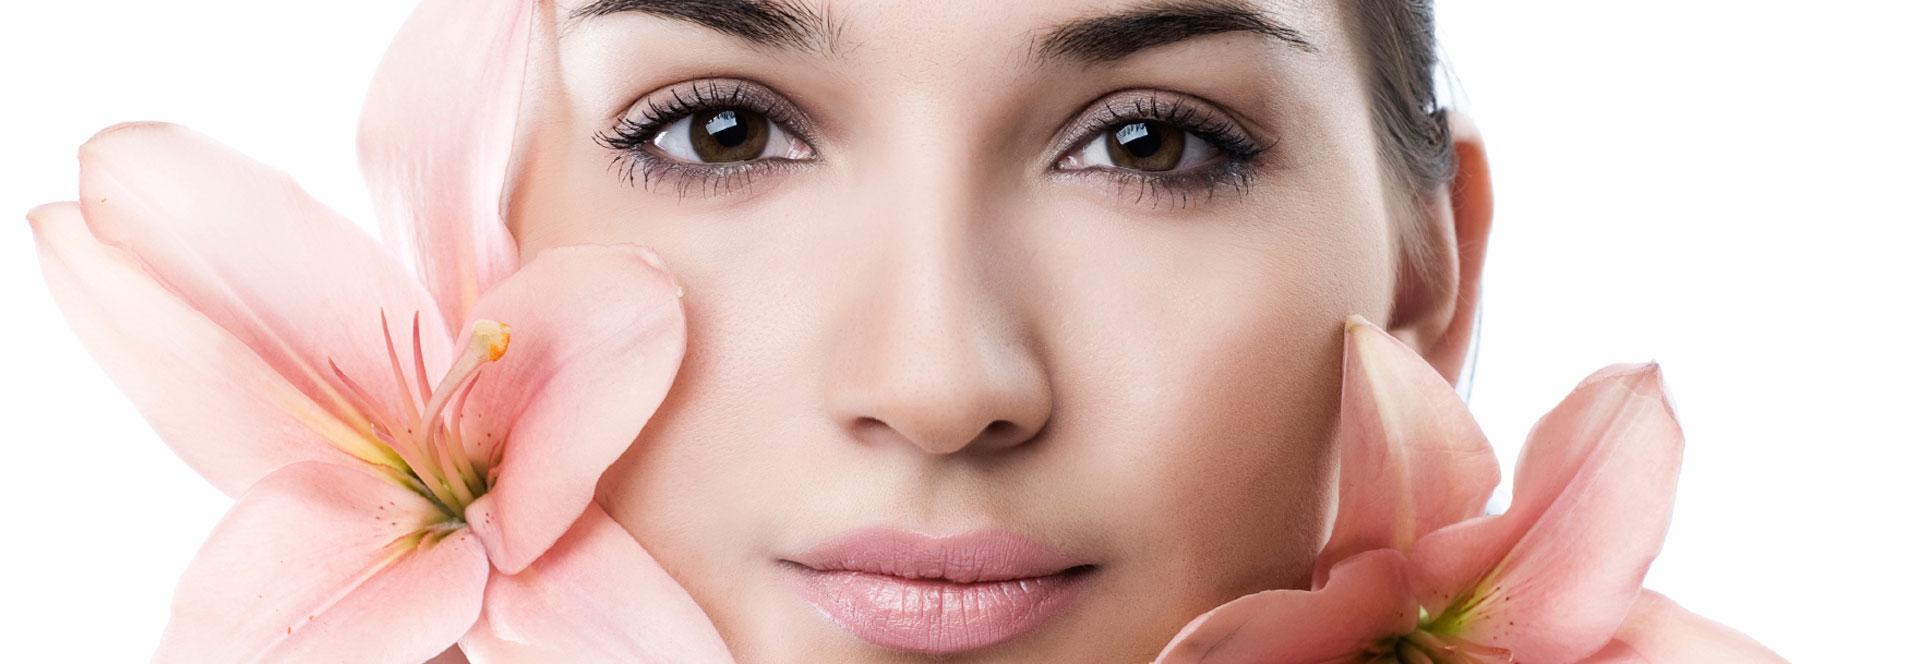 head beauty - لیزر اینفینی آر اف : عوارض جانبی لیزر اینفینی (Infini)